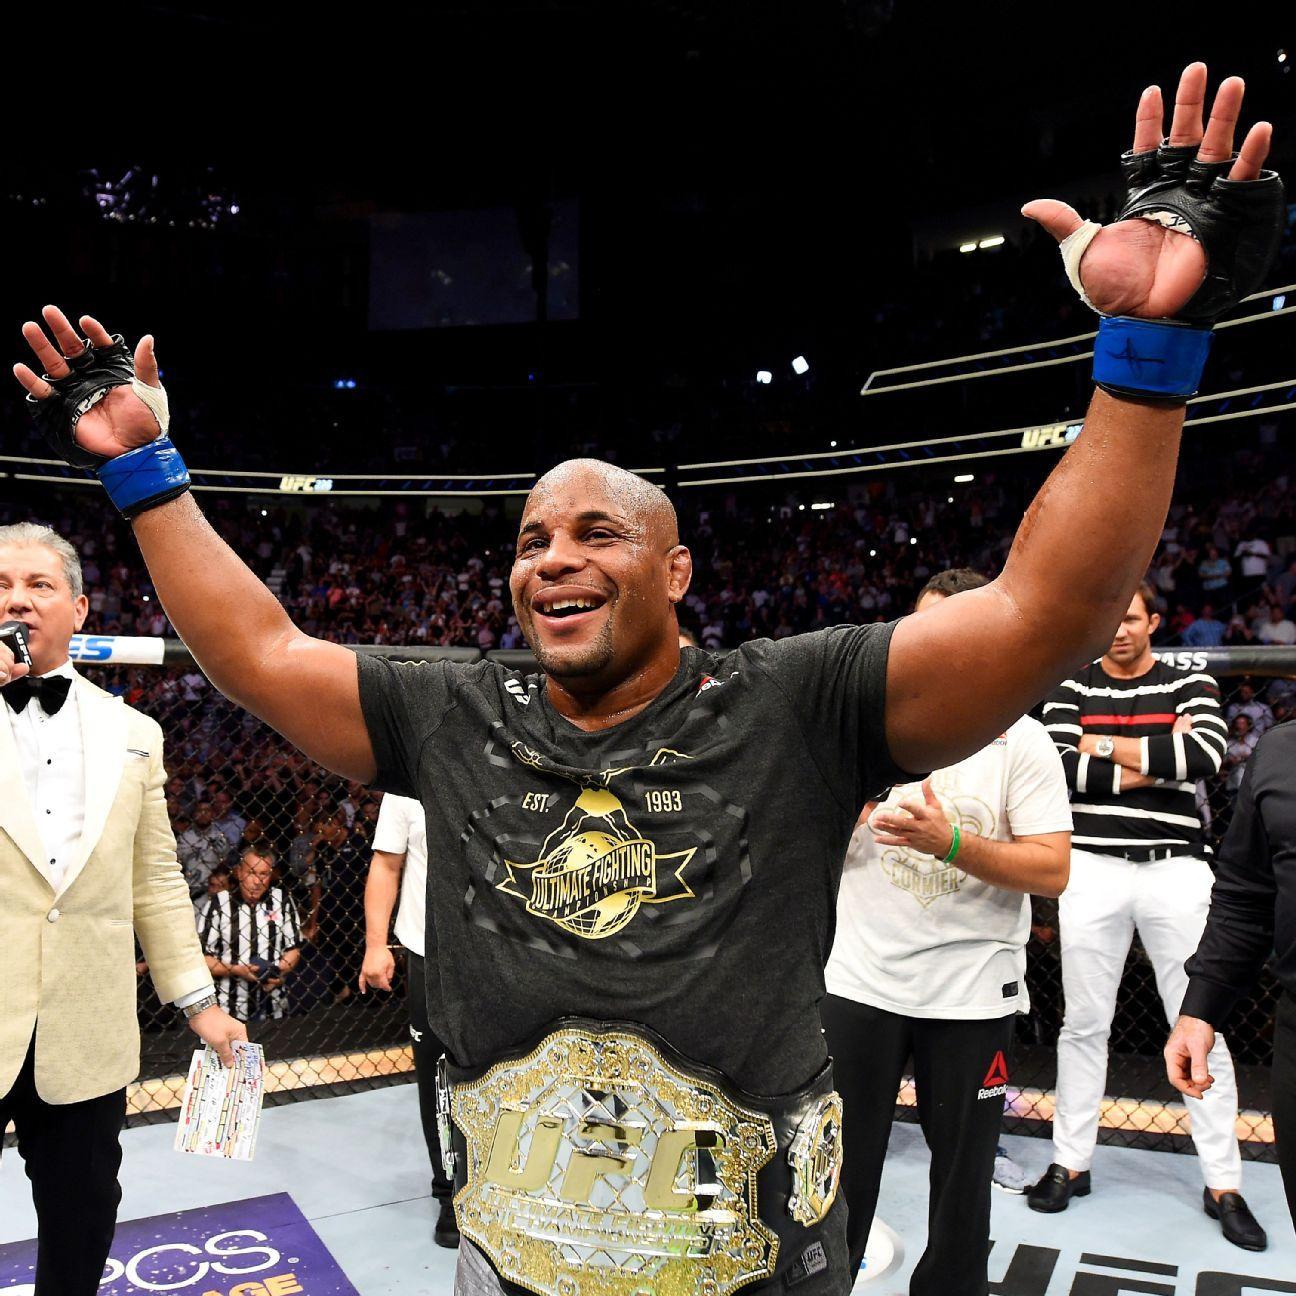 USADA Confirms Brock Lesnar's Entry Into UFC's Anti-doping Program